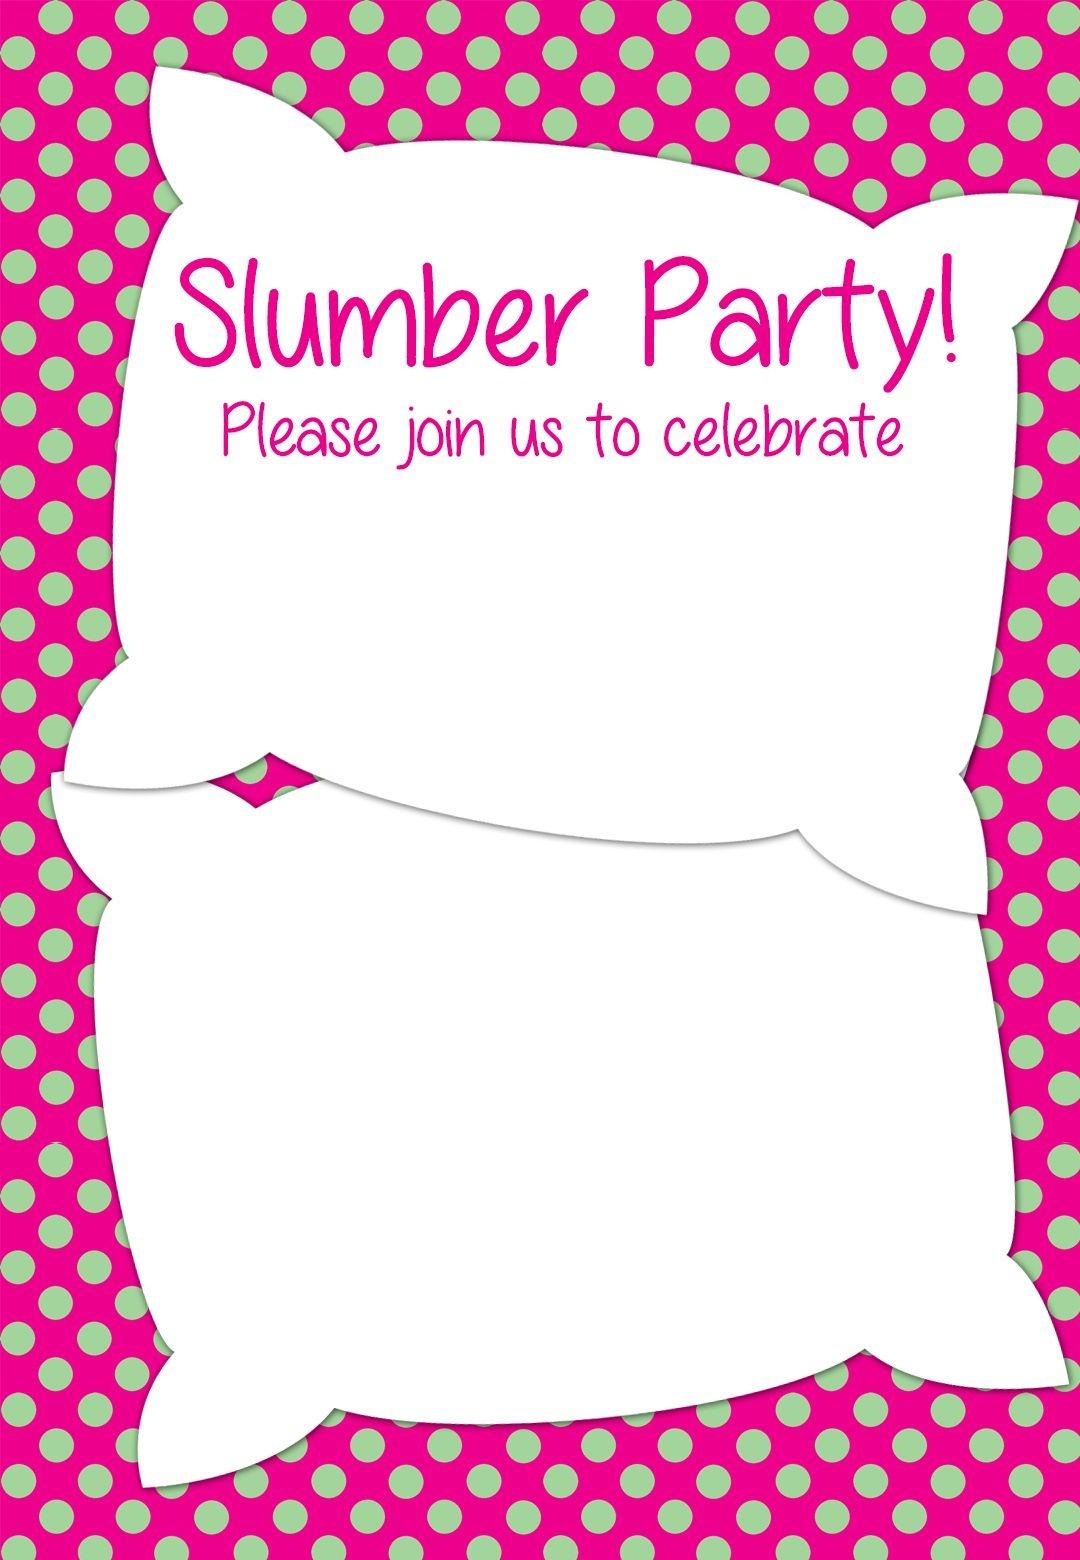 Free Printable Slumber Party Invitation | Party Ideas In 2019 - Free Printable Spa Party Invitations Templates